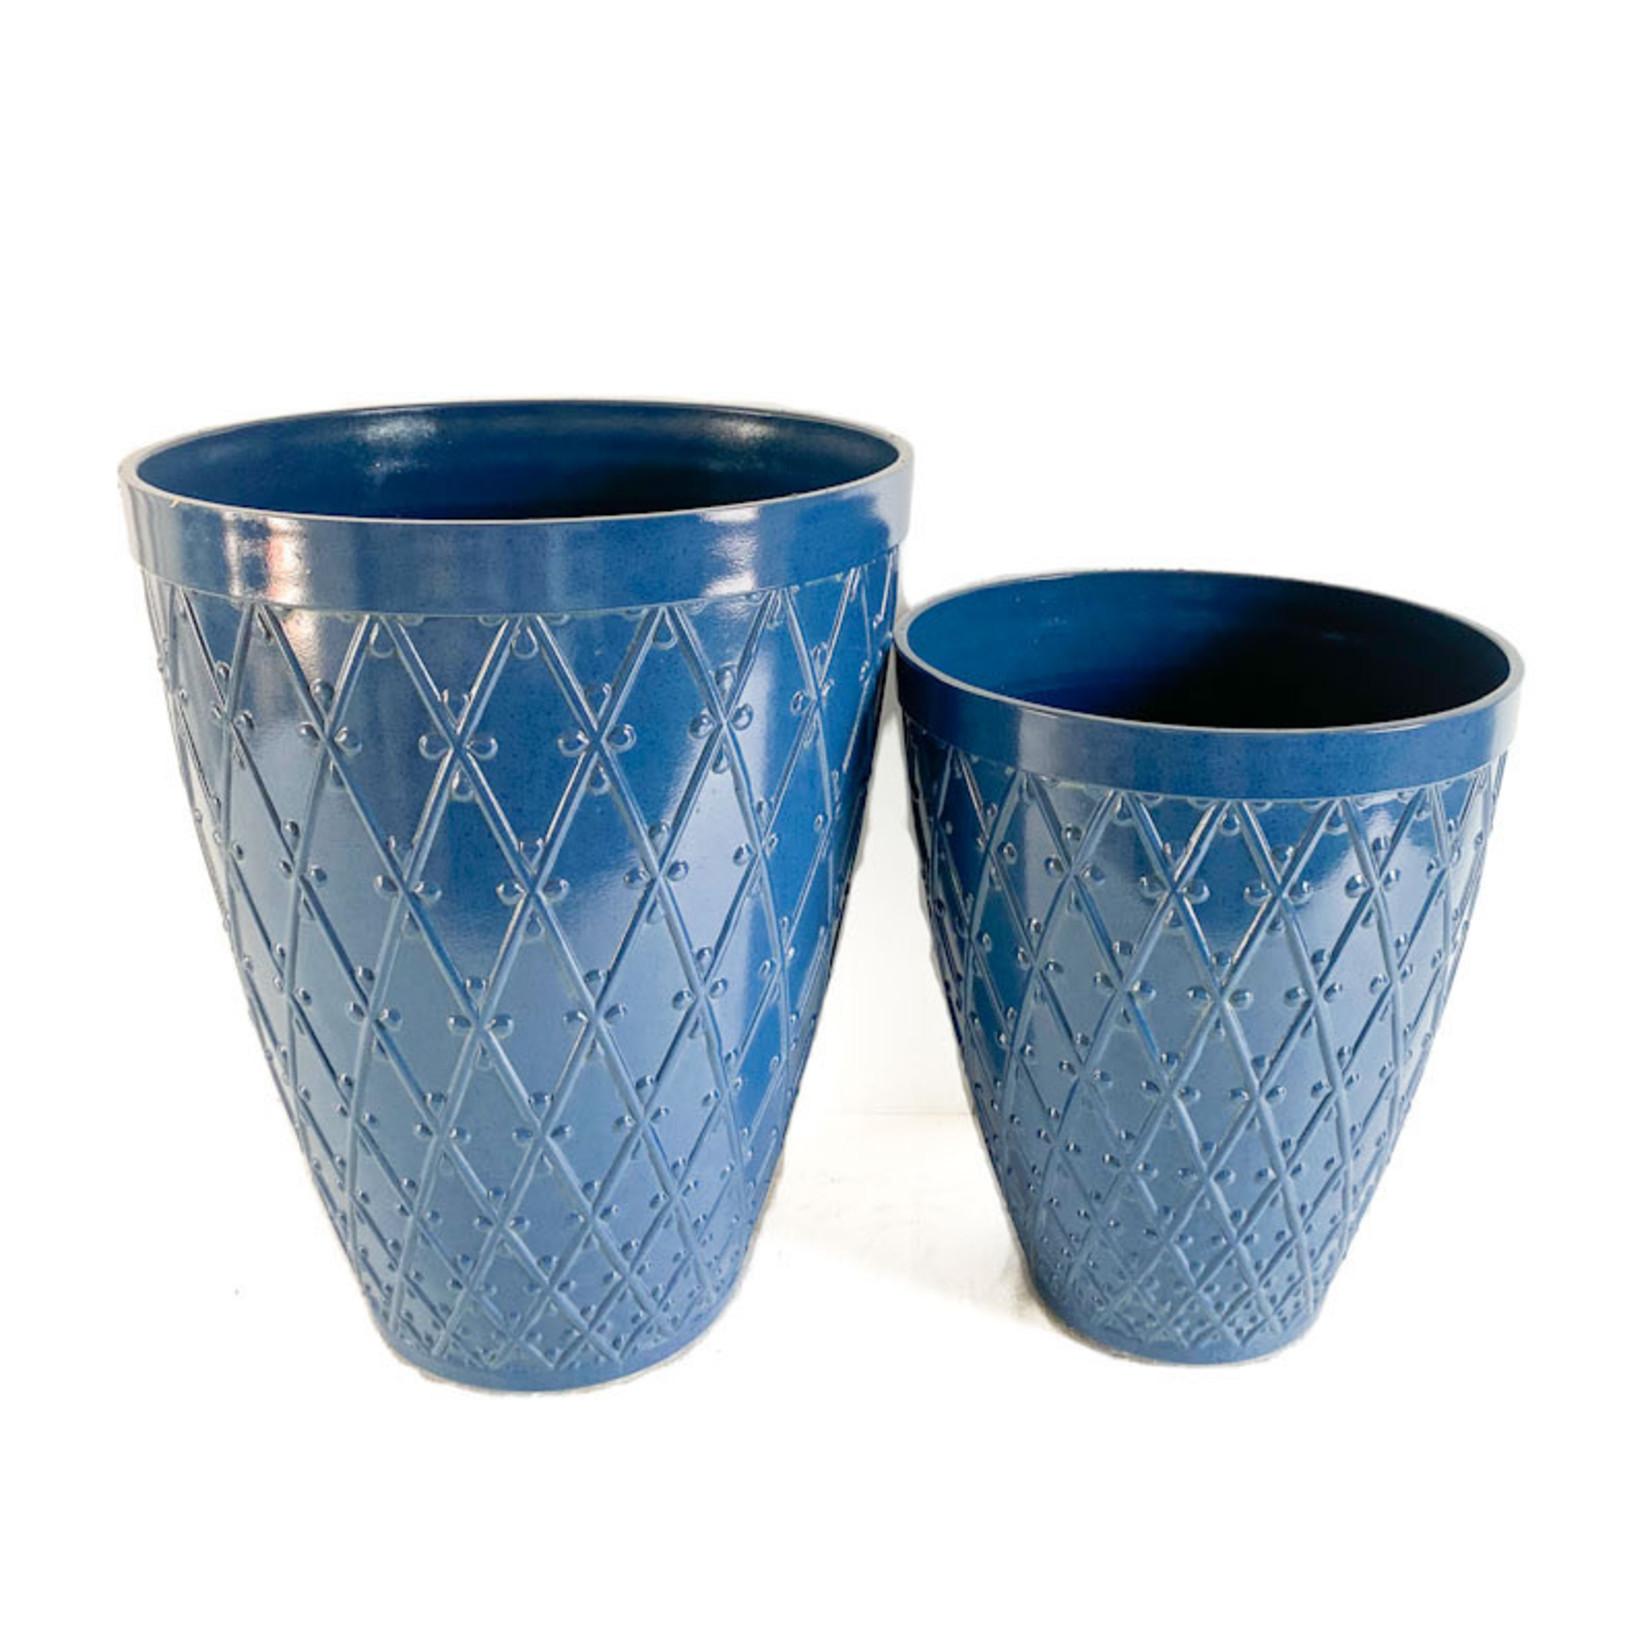 Raised Diamond Planter - Blueberry Glaze